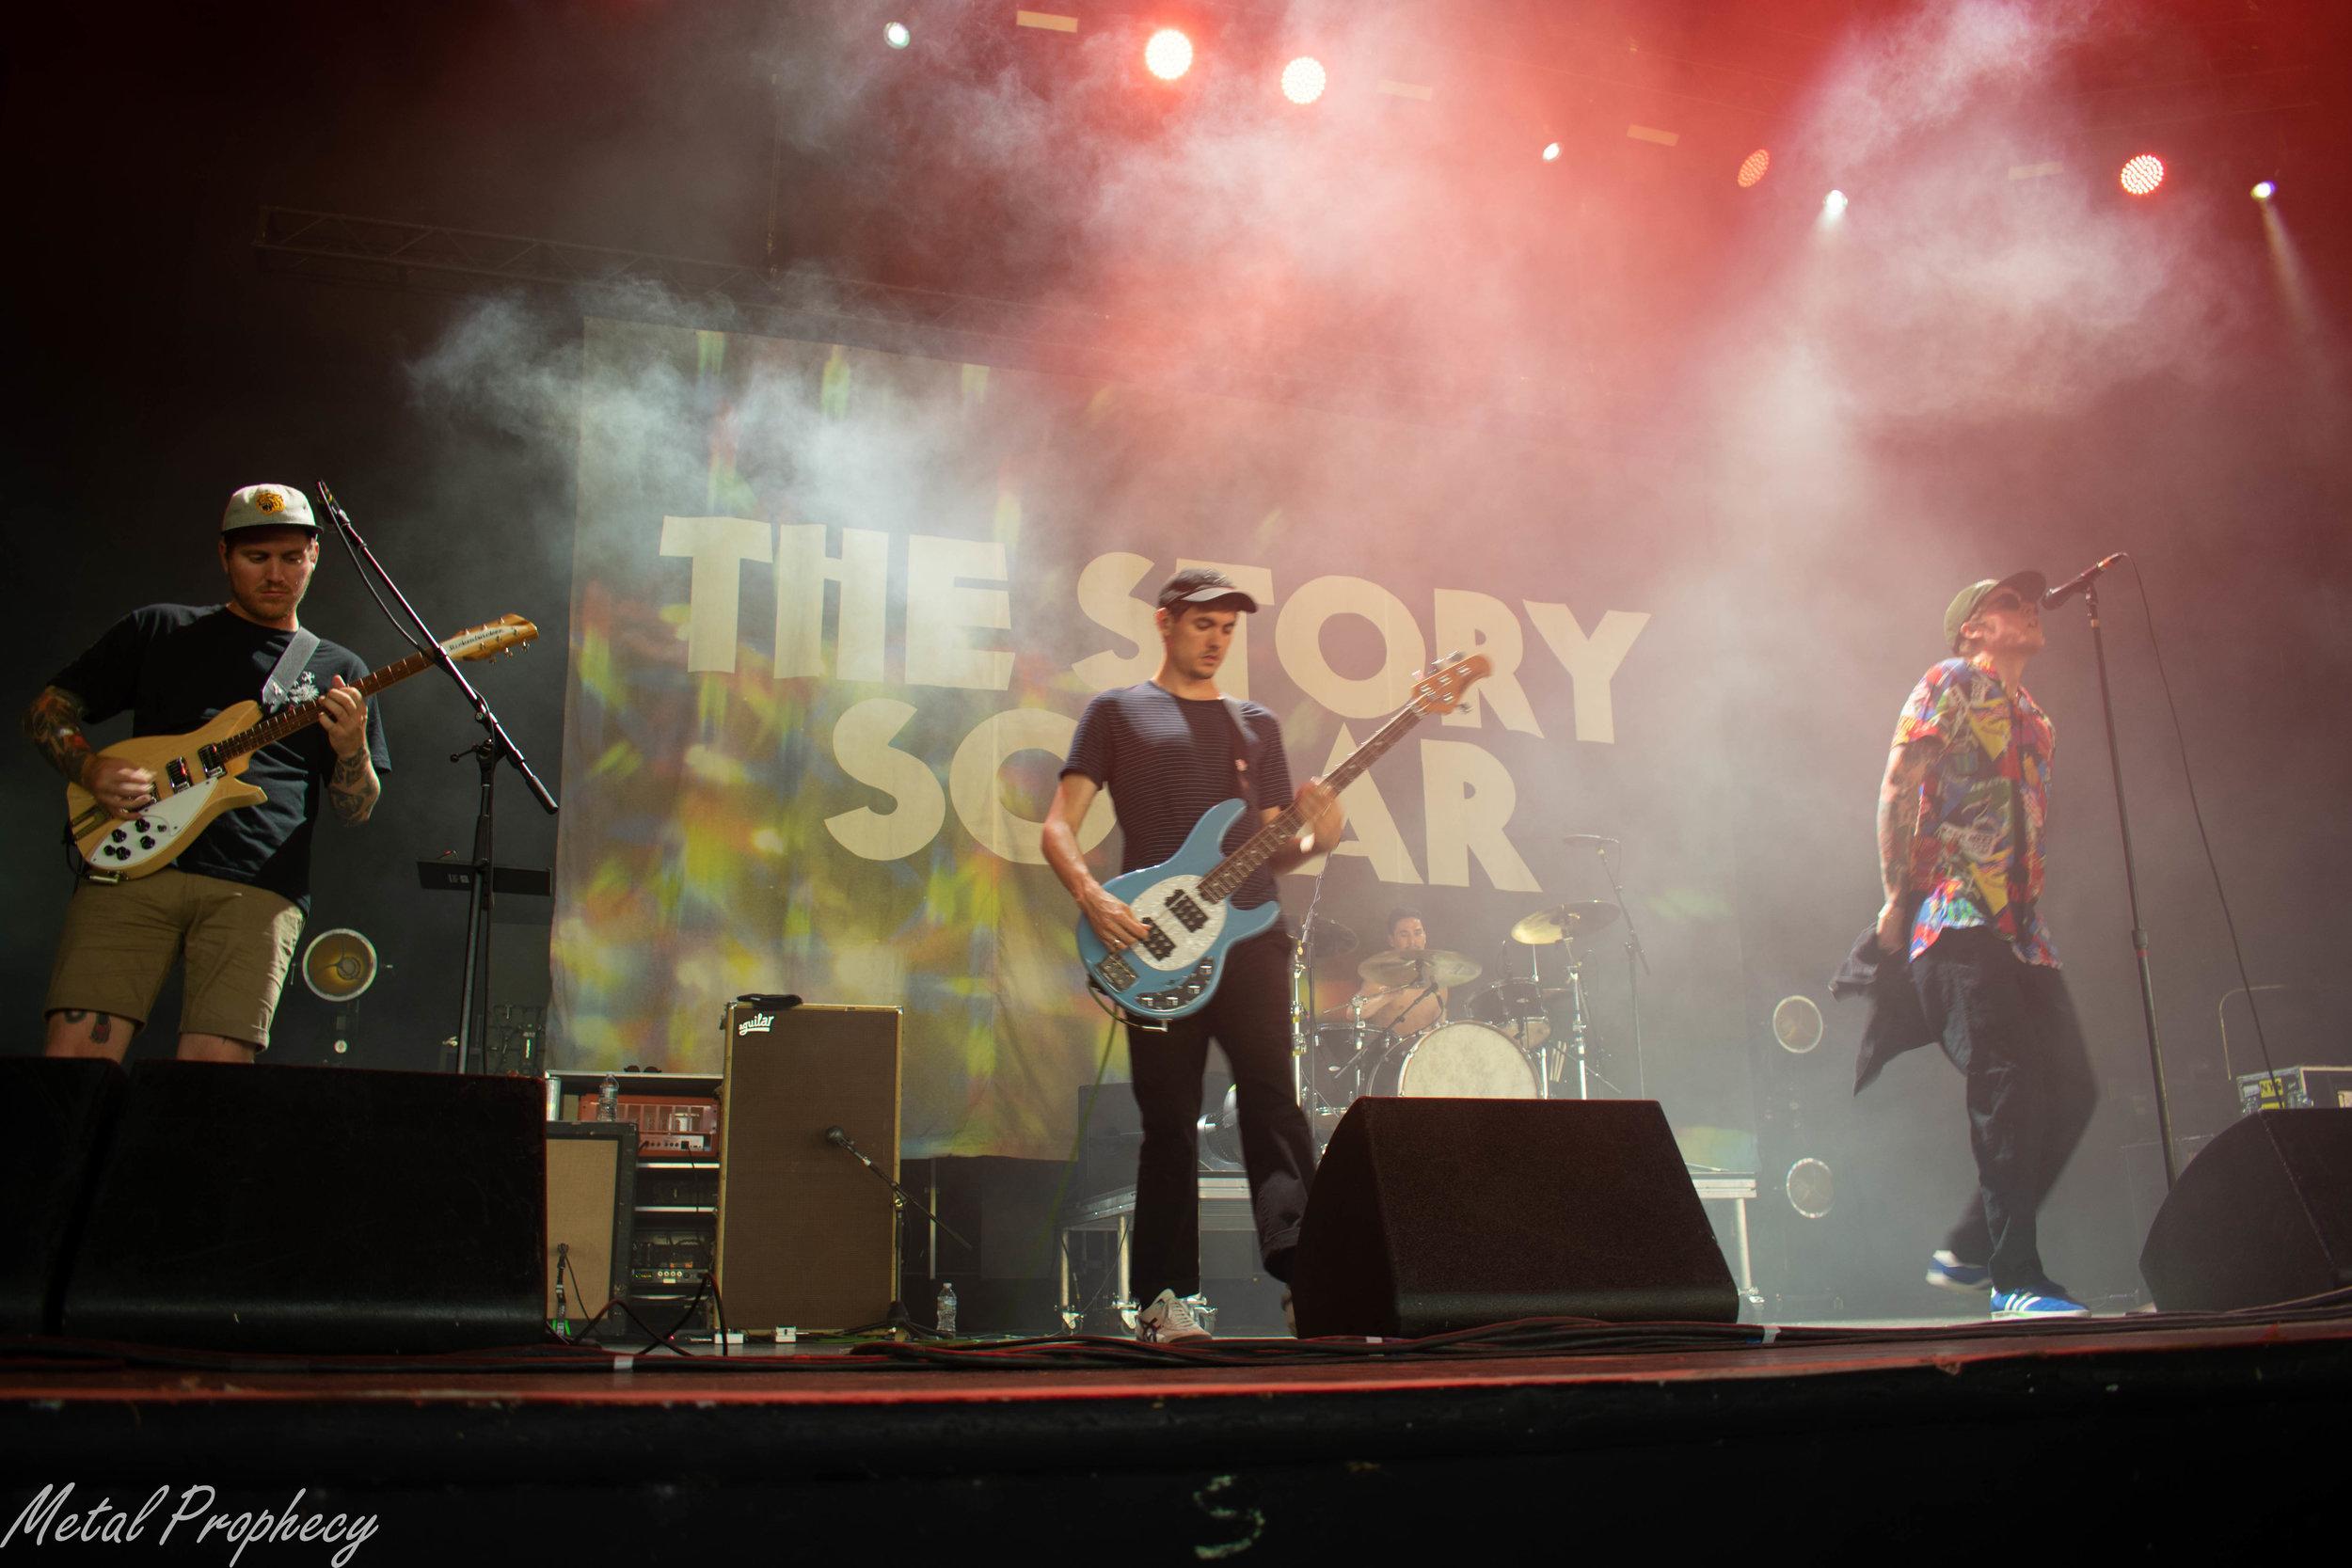 The Story So Far at Rockstar Disrupt Festival